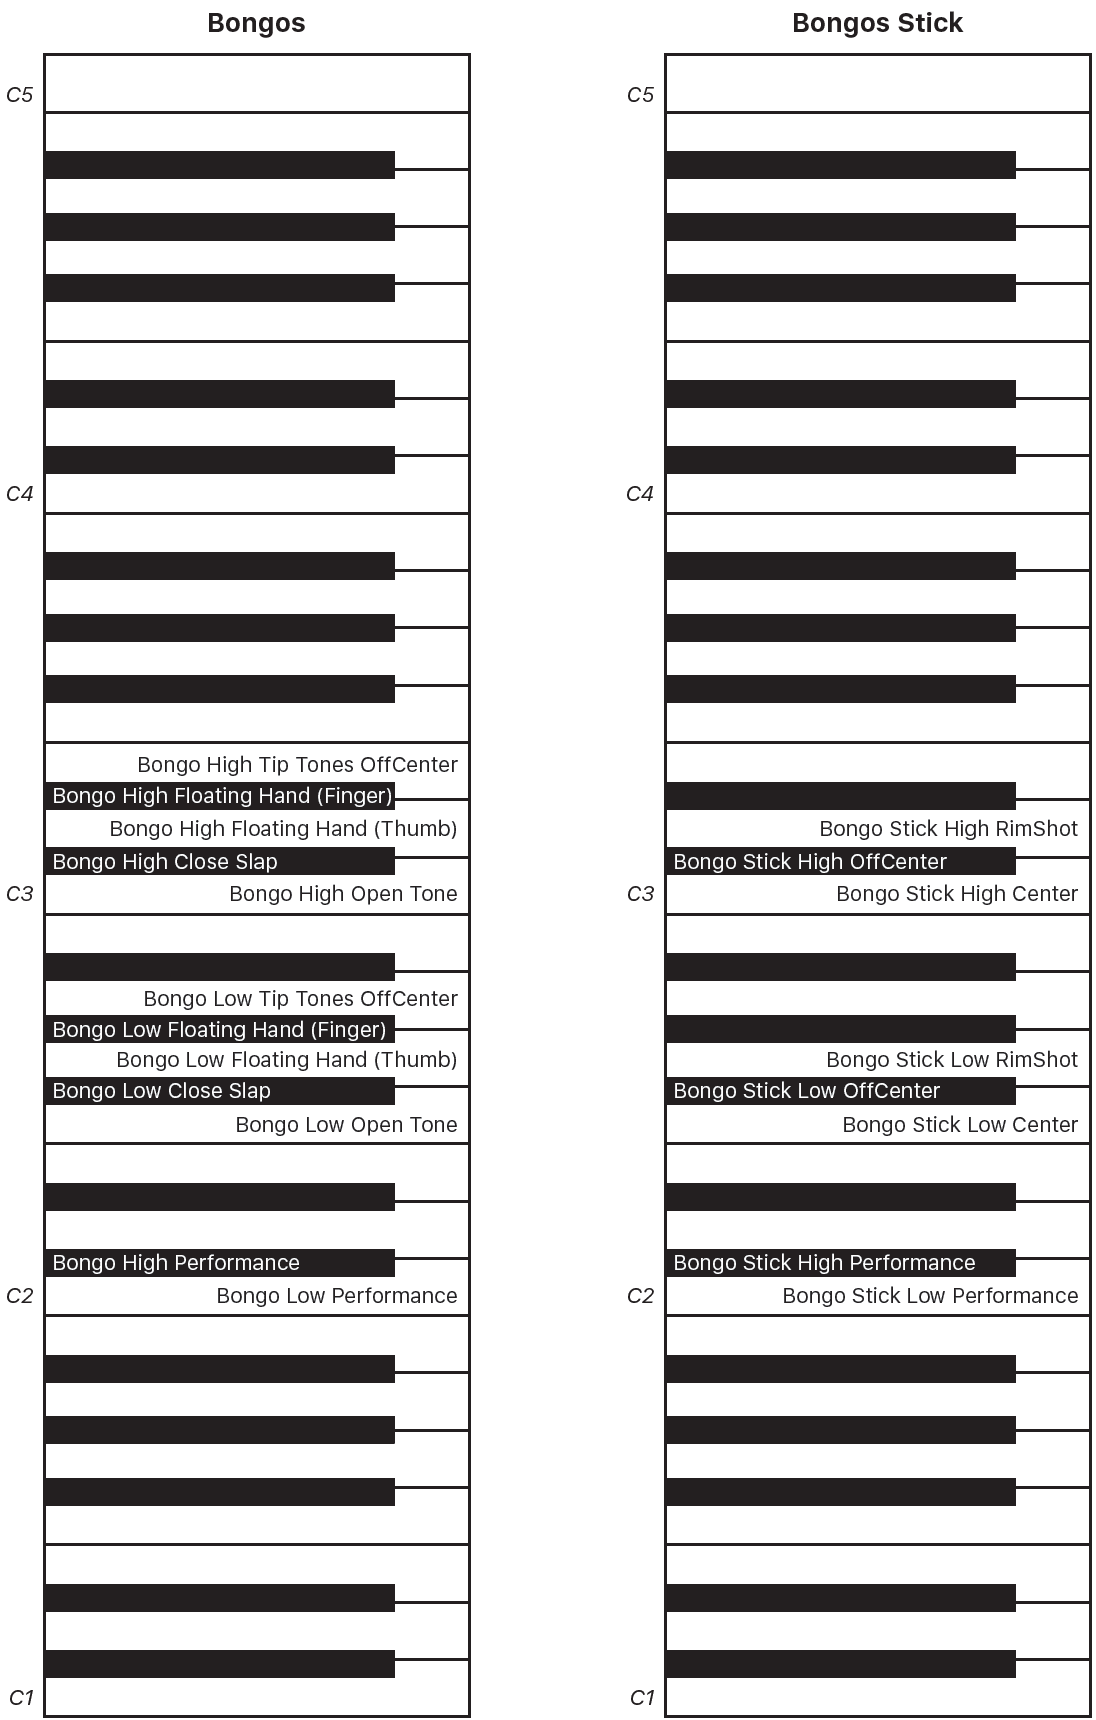 Figure. Bongos and Bongos Stick performance keyboard maps.